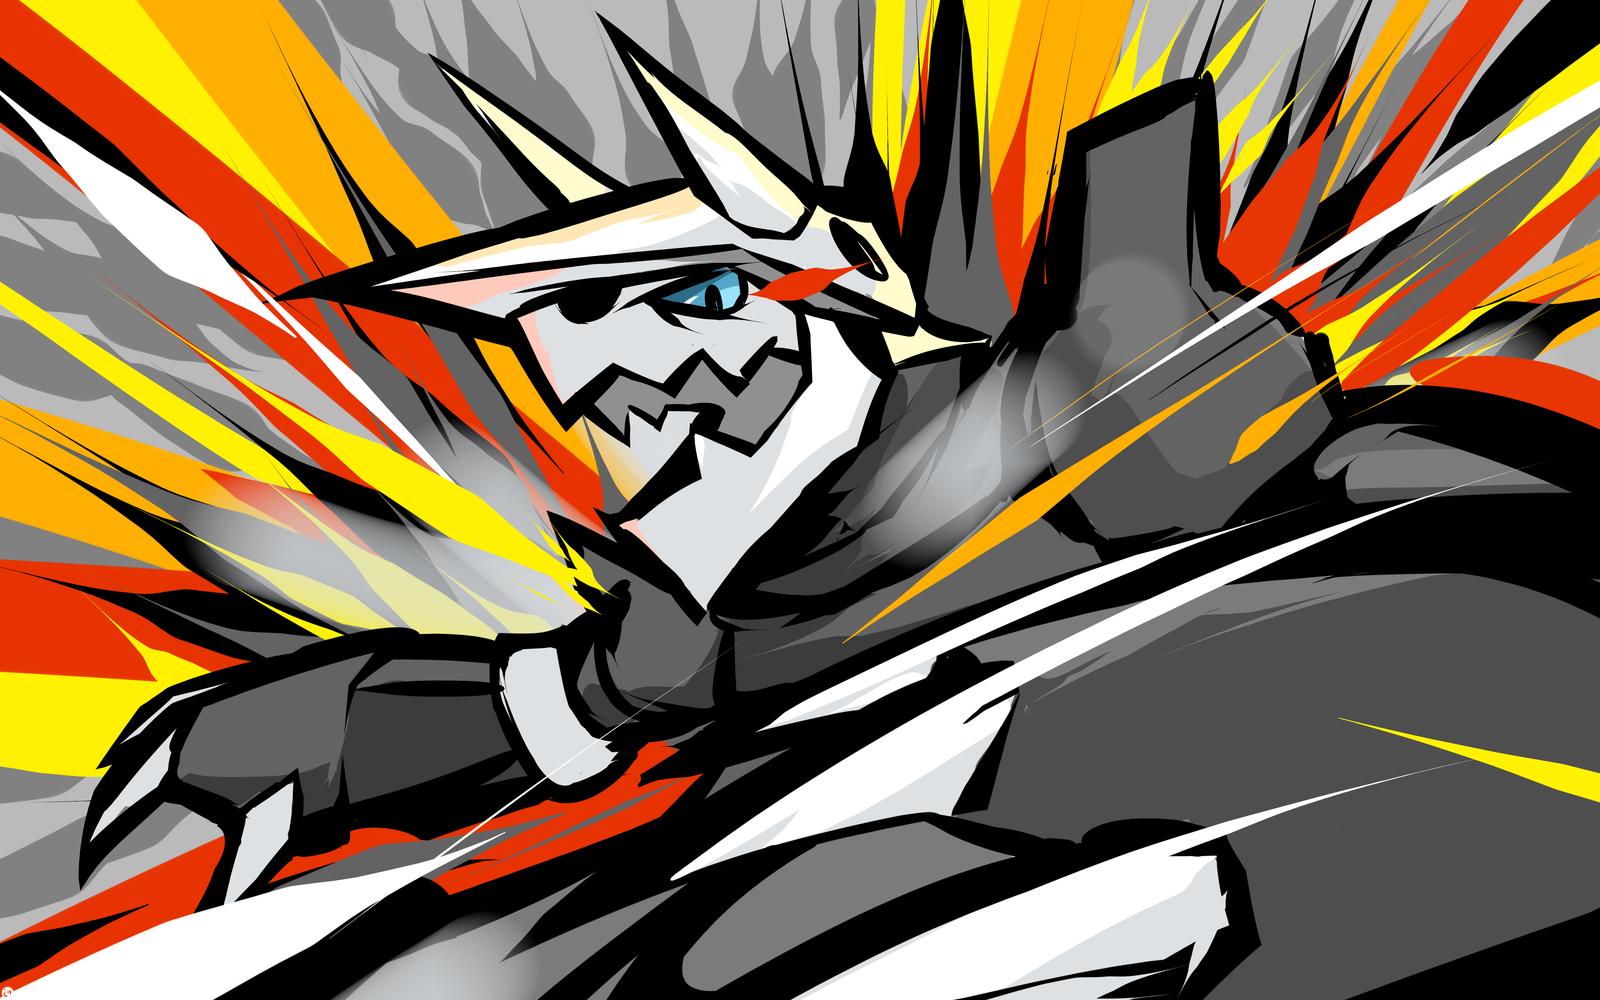 Aggron Metal Burst by ishmam 1600x1000